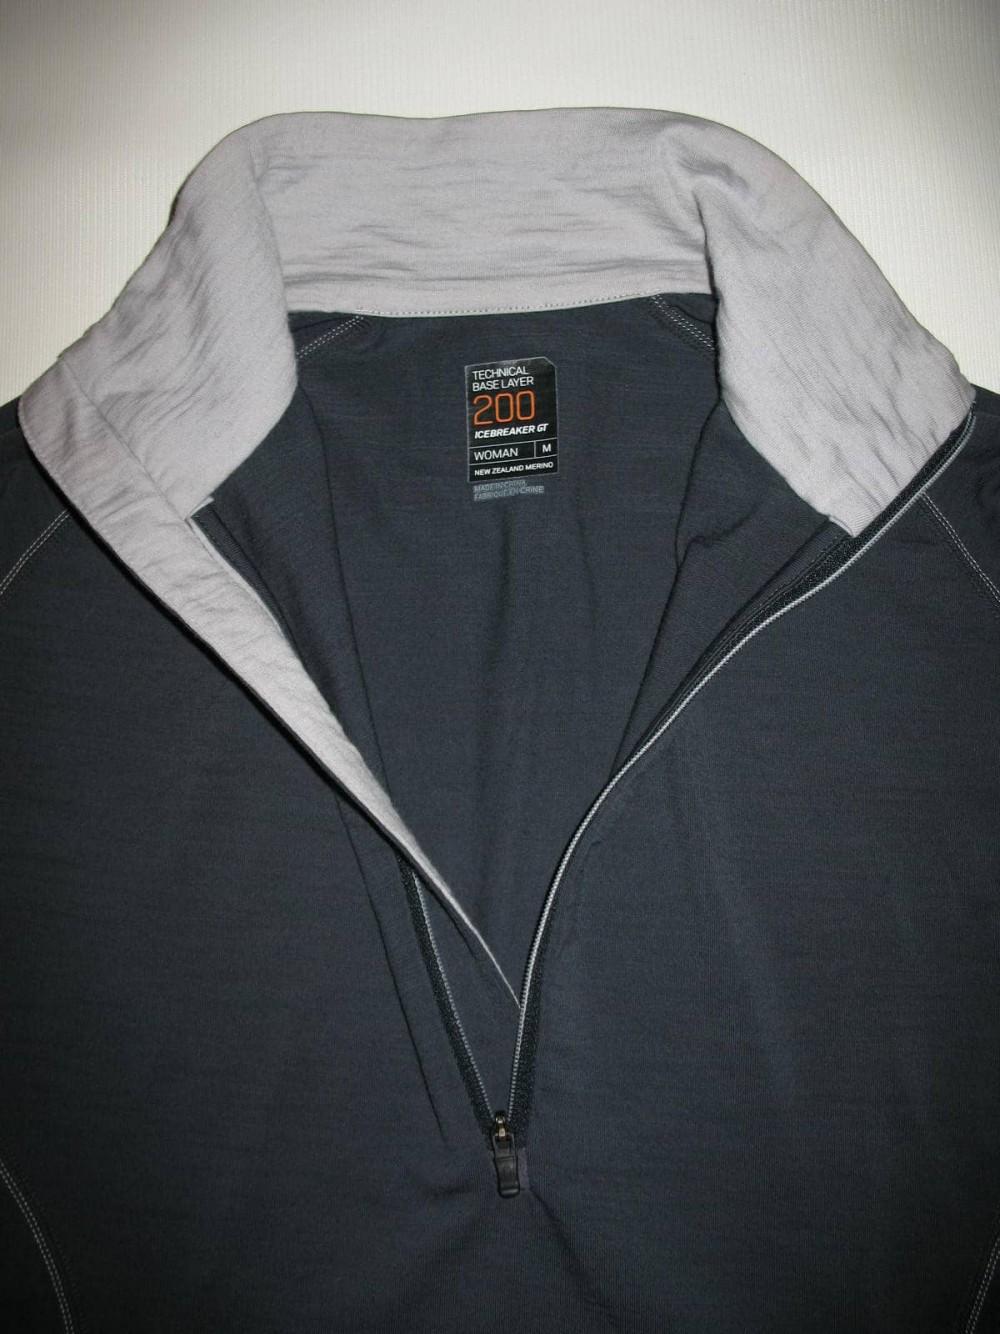 Термобелье ICEBREAKER GT 200 jersey lady (размер M/мужской S) - 3